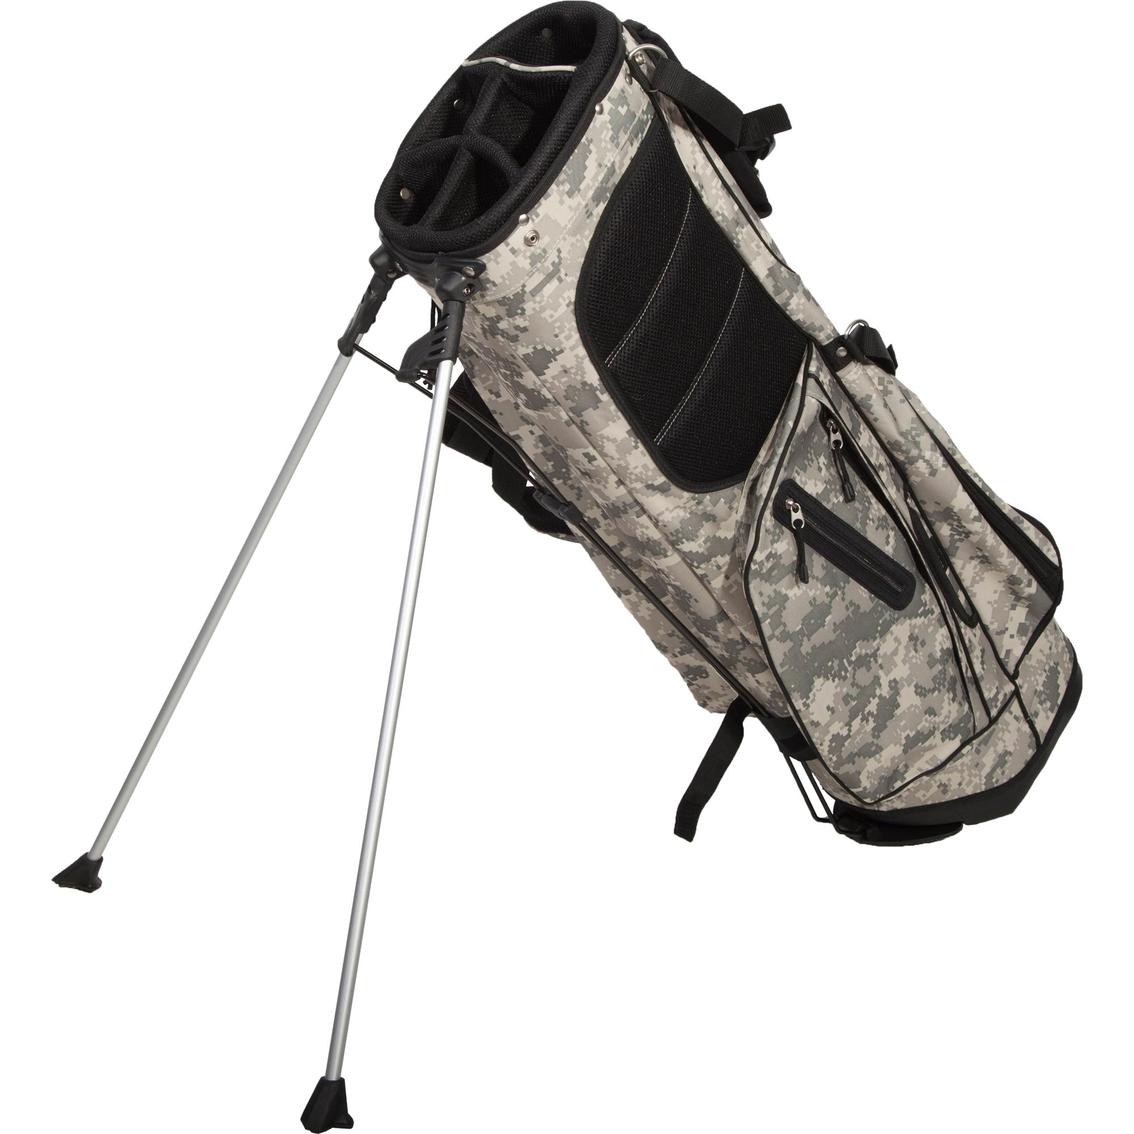 00c270ff3d1c Pinemeadow Golf Digital Camo Golf Stand Bag